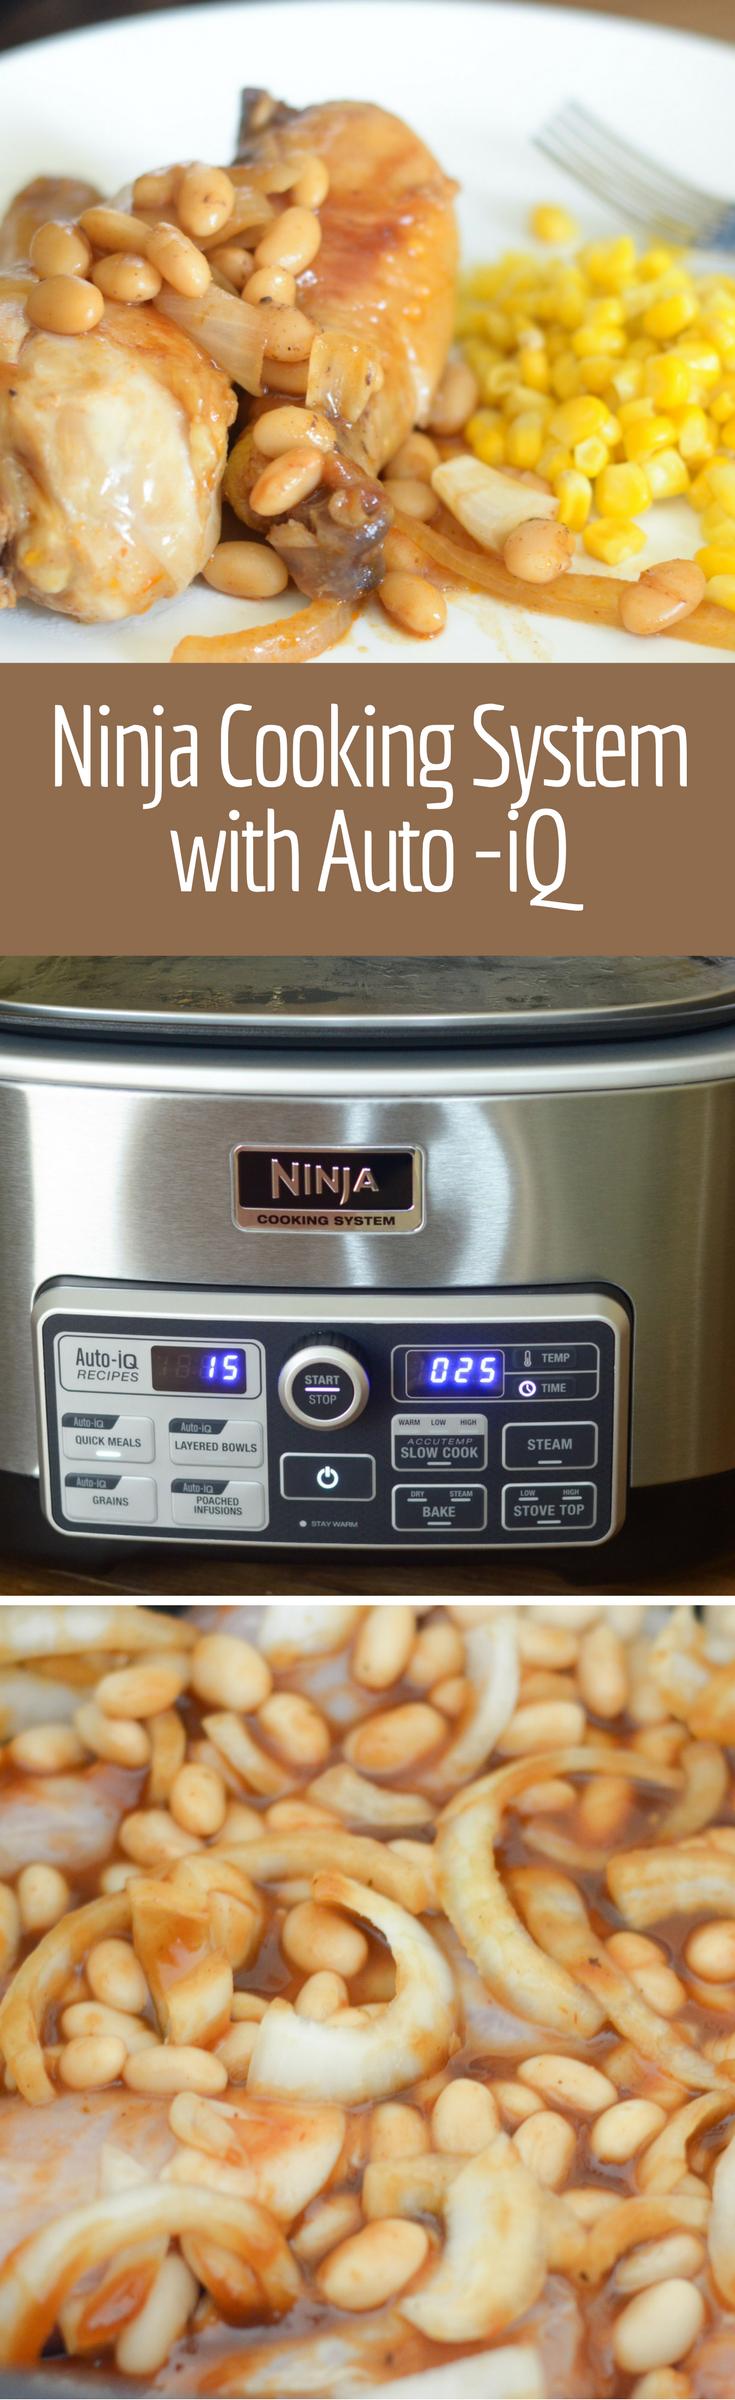 Ninja Cooking System With Auto IQ #NinjaDeliciouslyDoneEasy #NinjaPartner